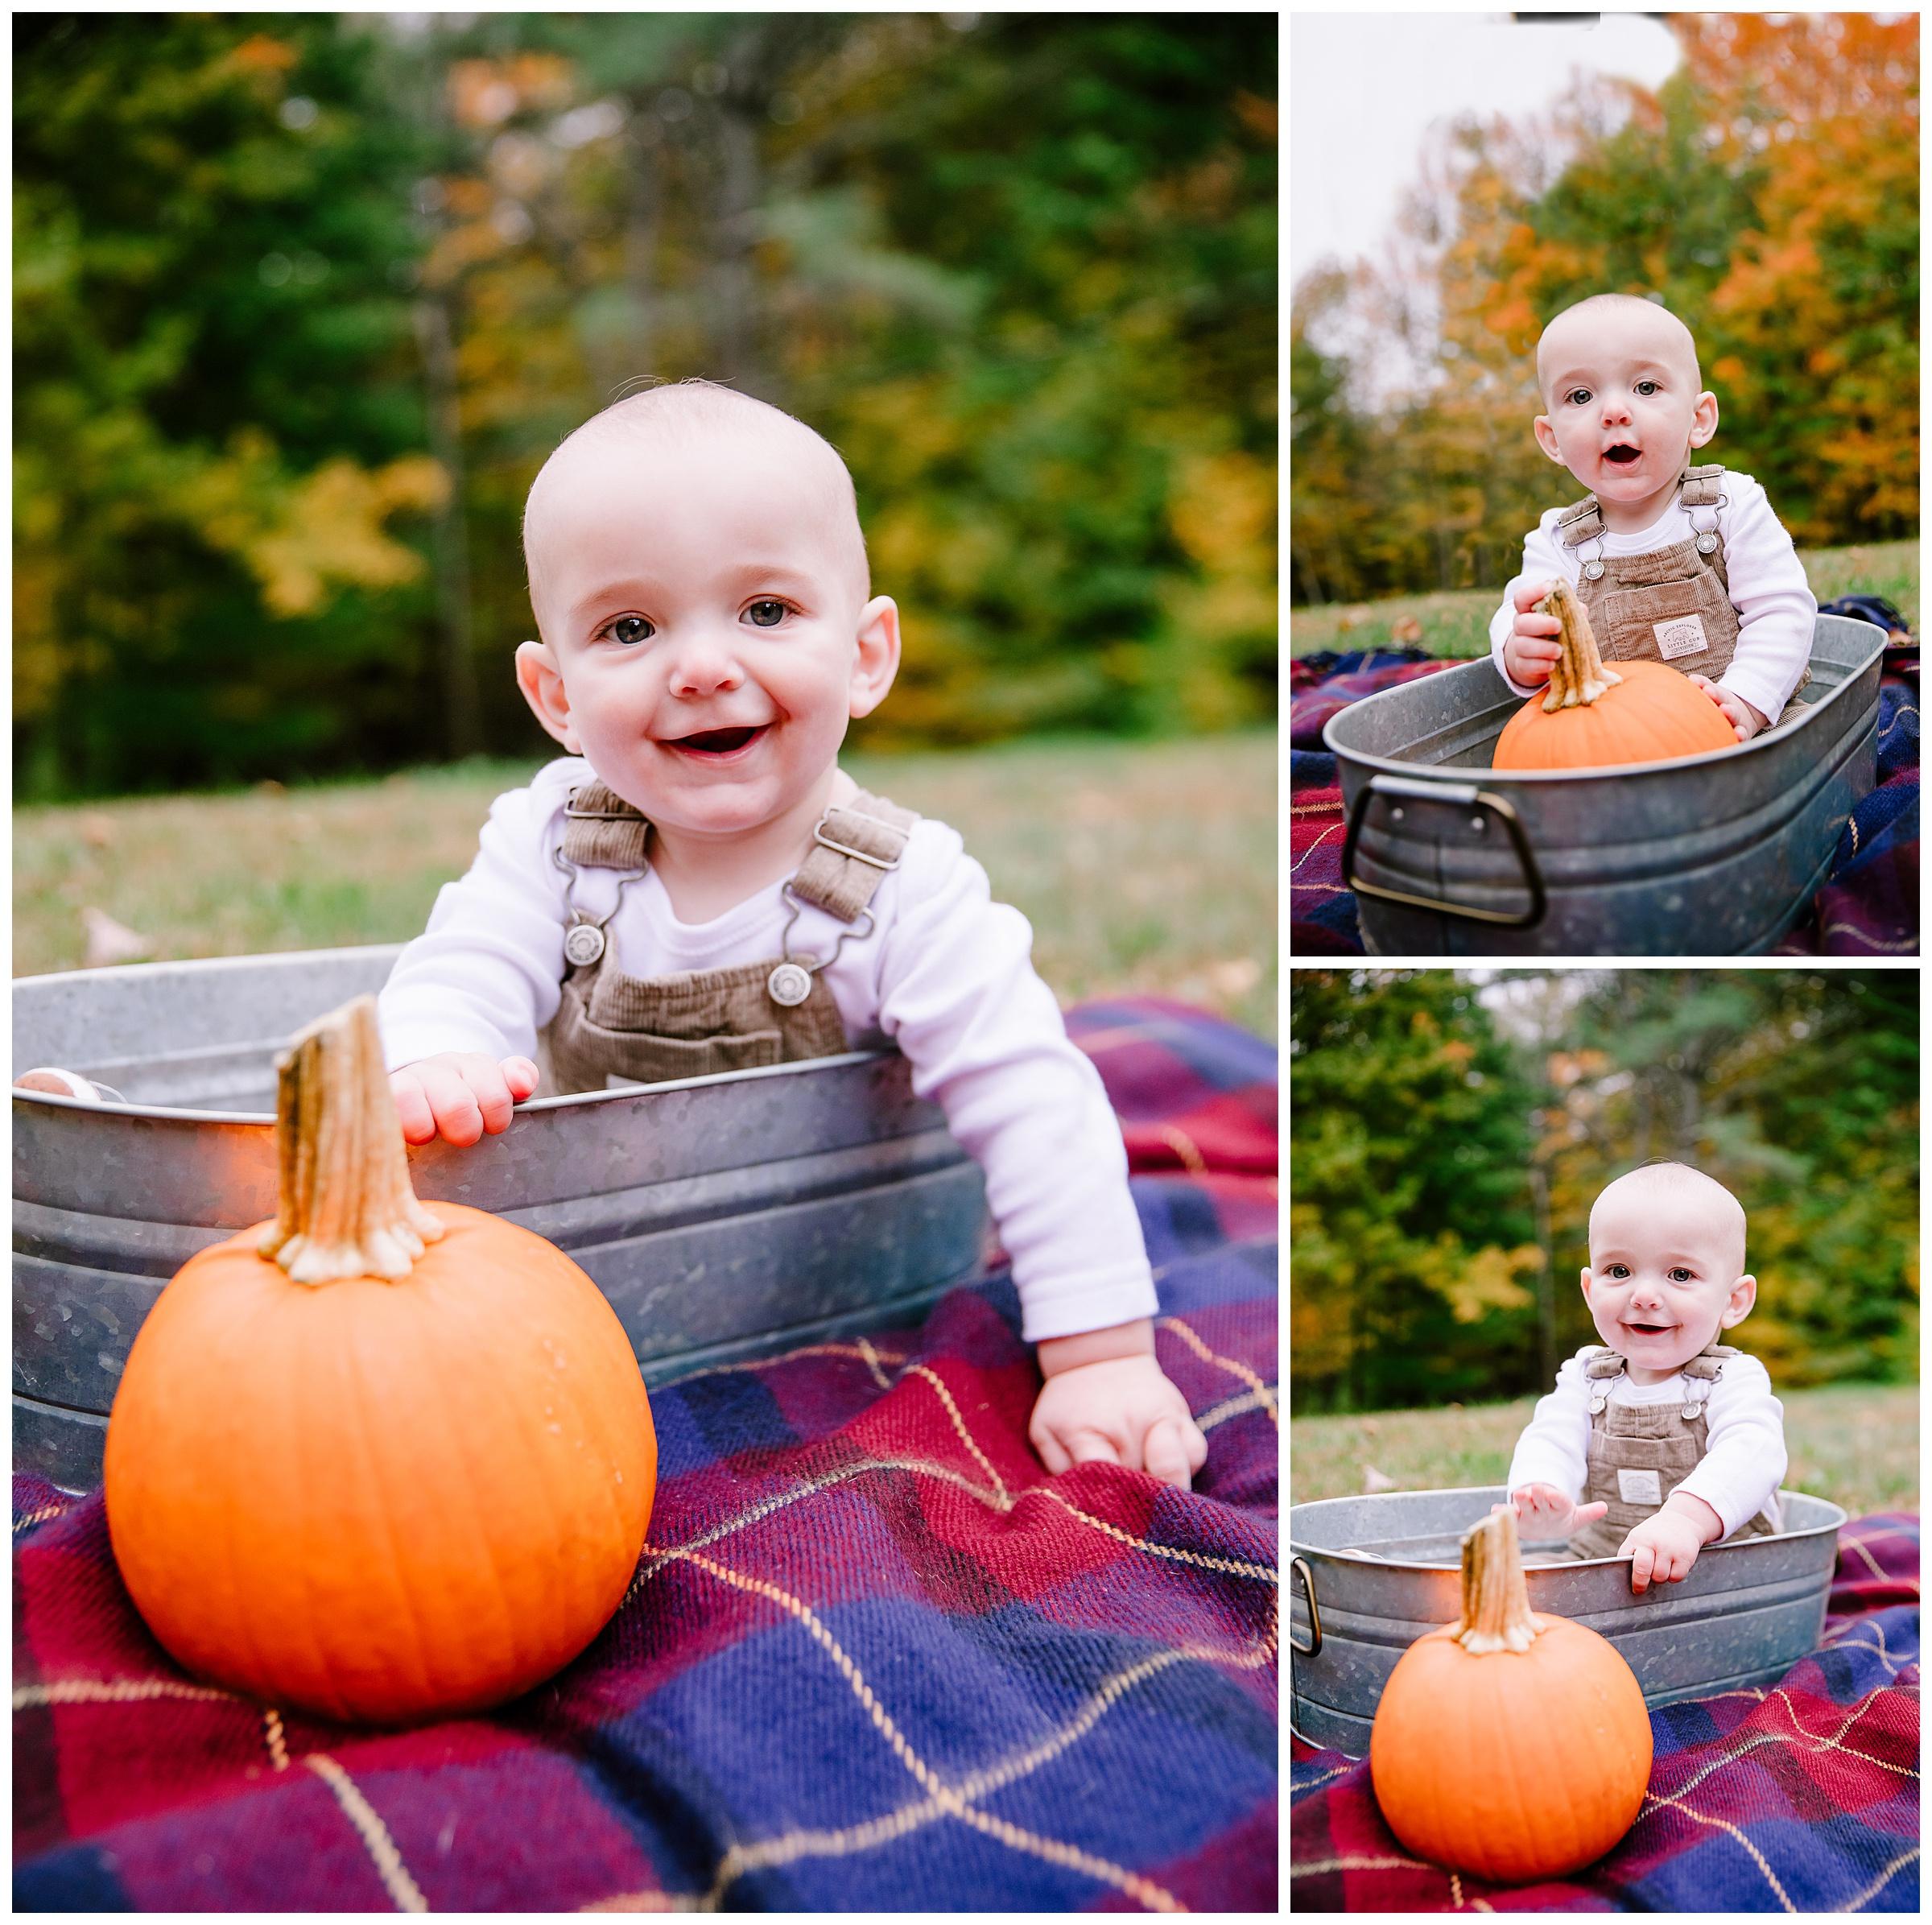 BLM,Brianna Morrissey,Brie Morrissey,Corbin,Corbin Hodgman,Oct,October,Photo,Photographer,Photography,ashley Croteau,www.blmphoto.com/contact,©BLM Photography 2019,